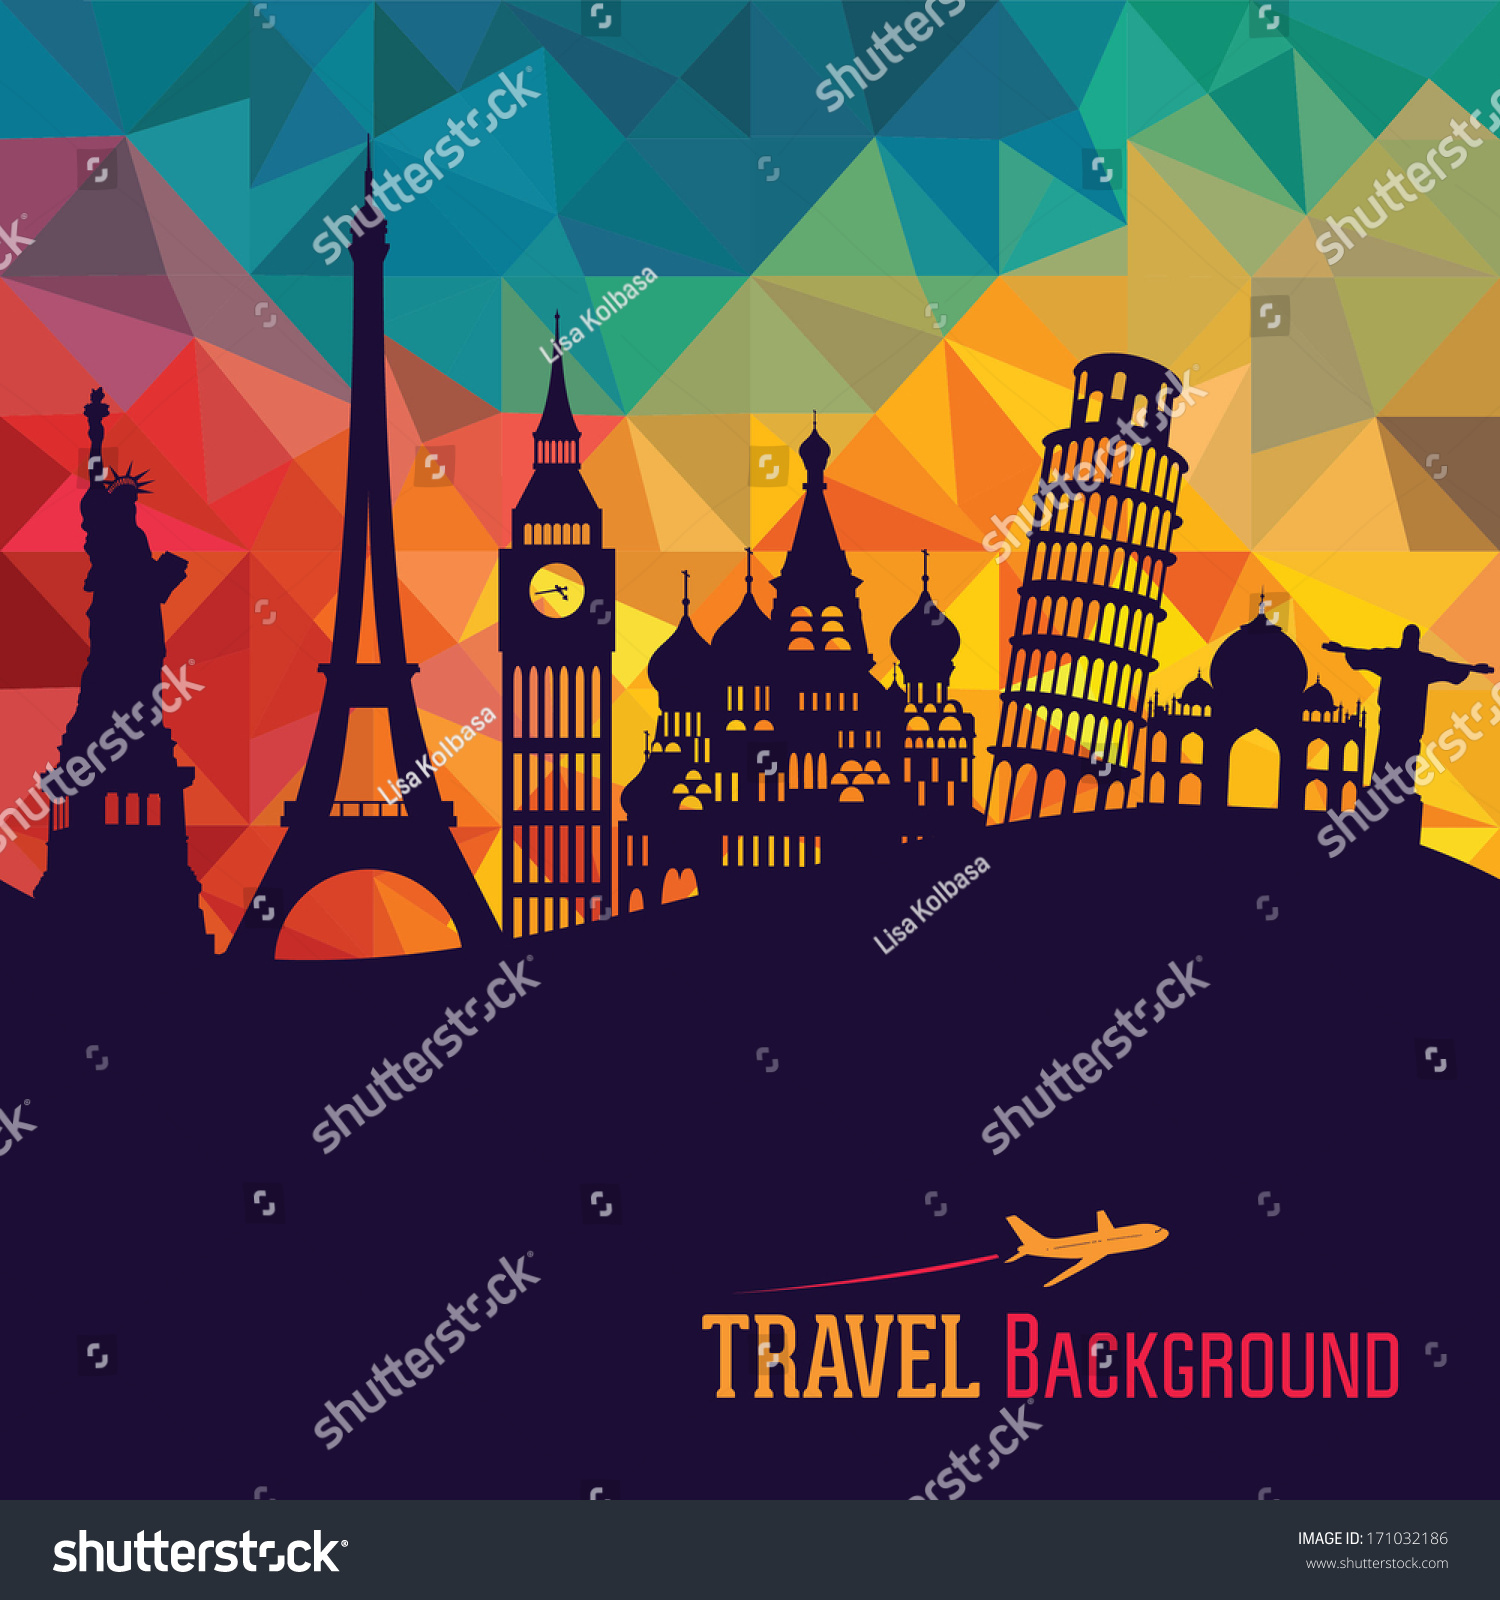 Travel Tourism Background Stock Vector 171032186 Shutterstock